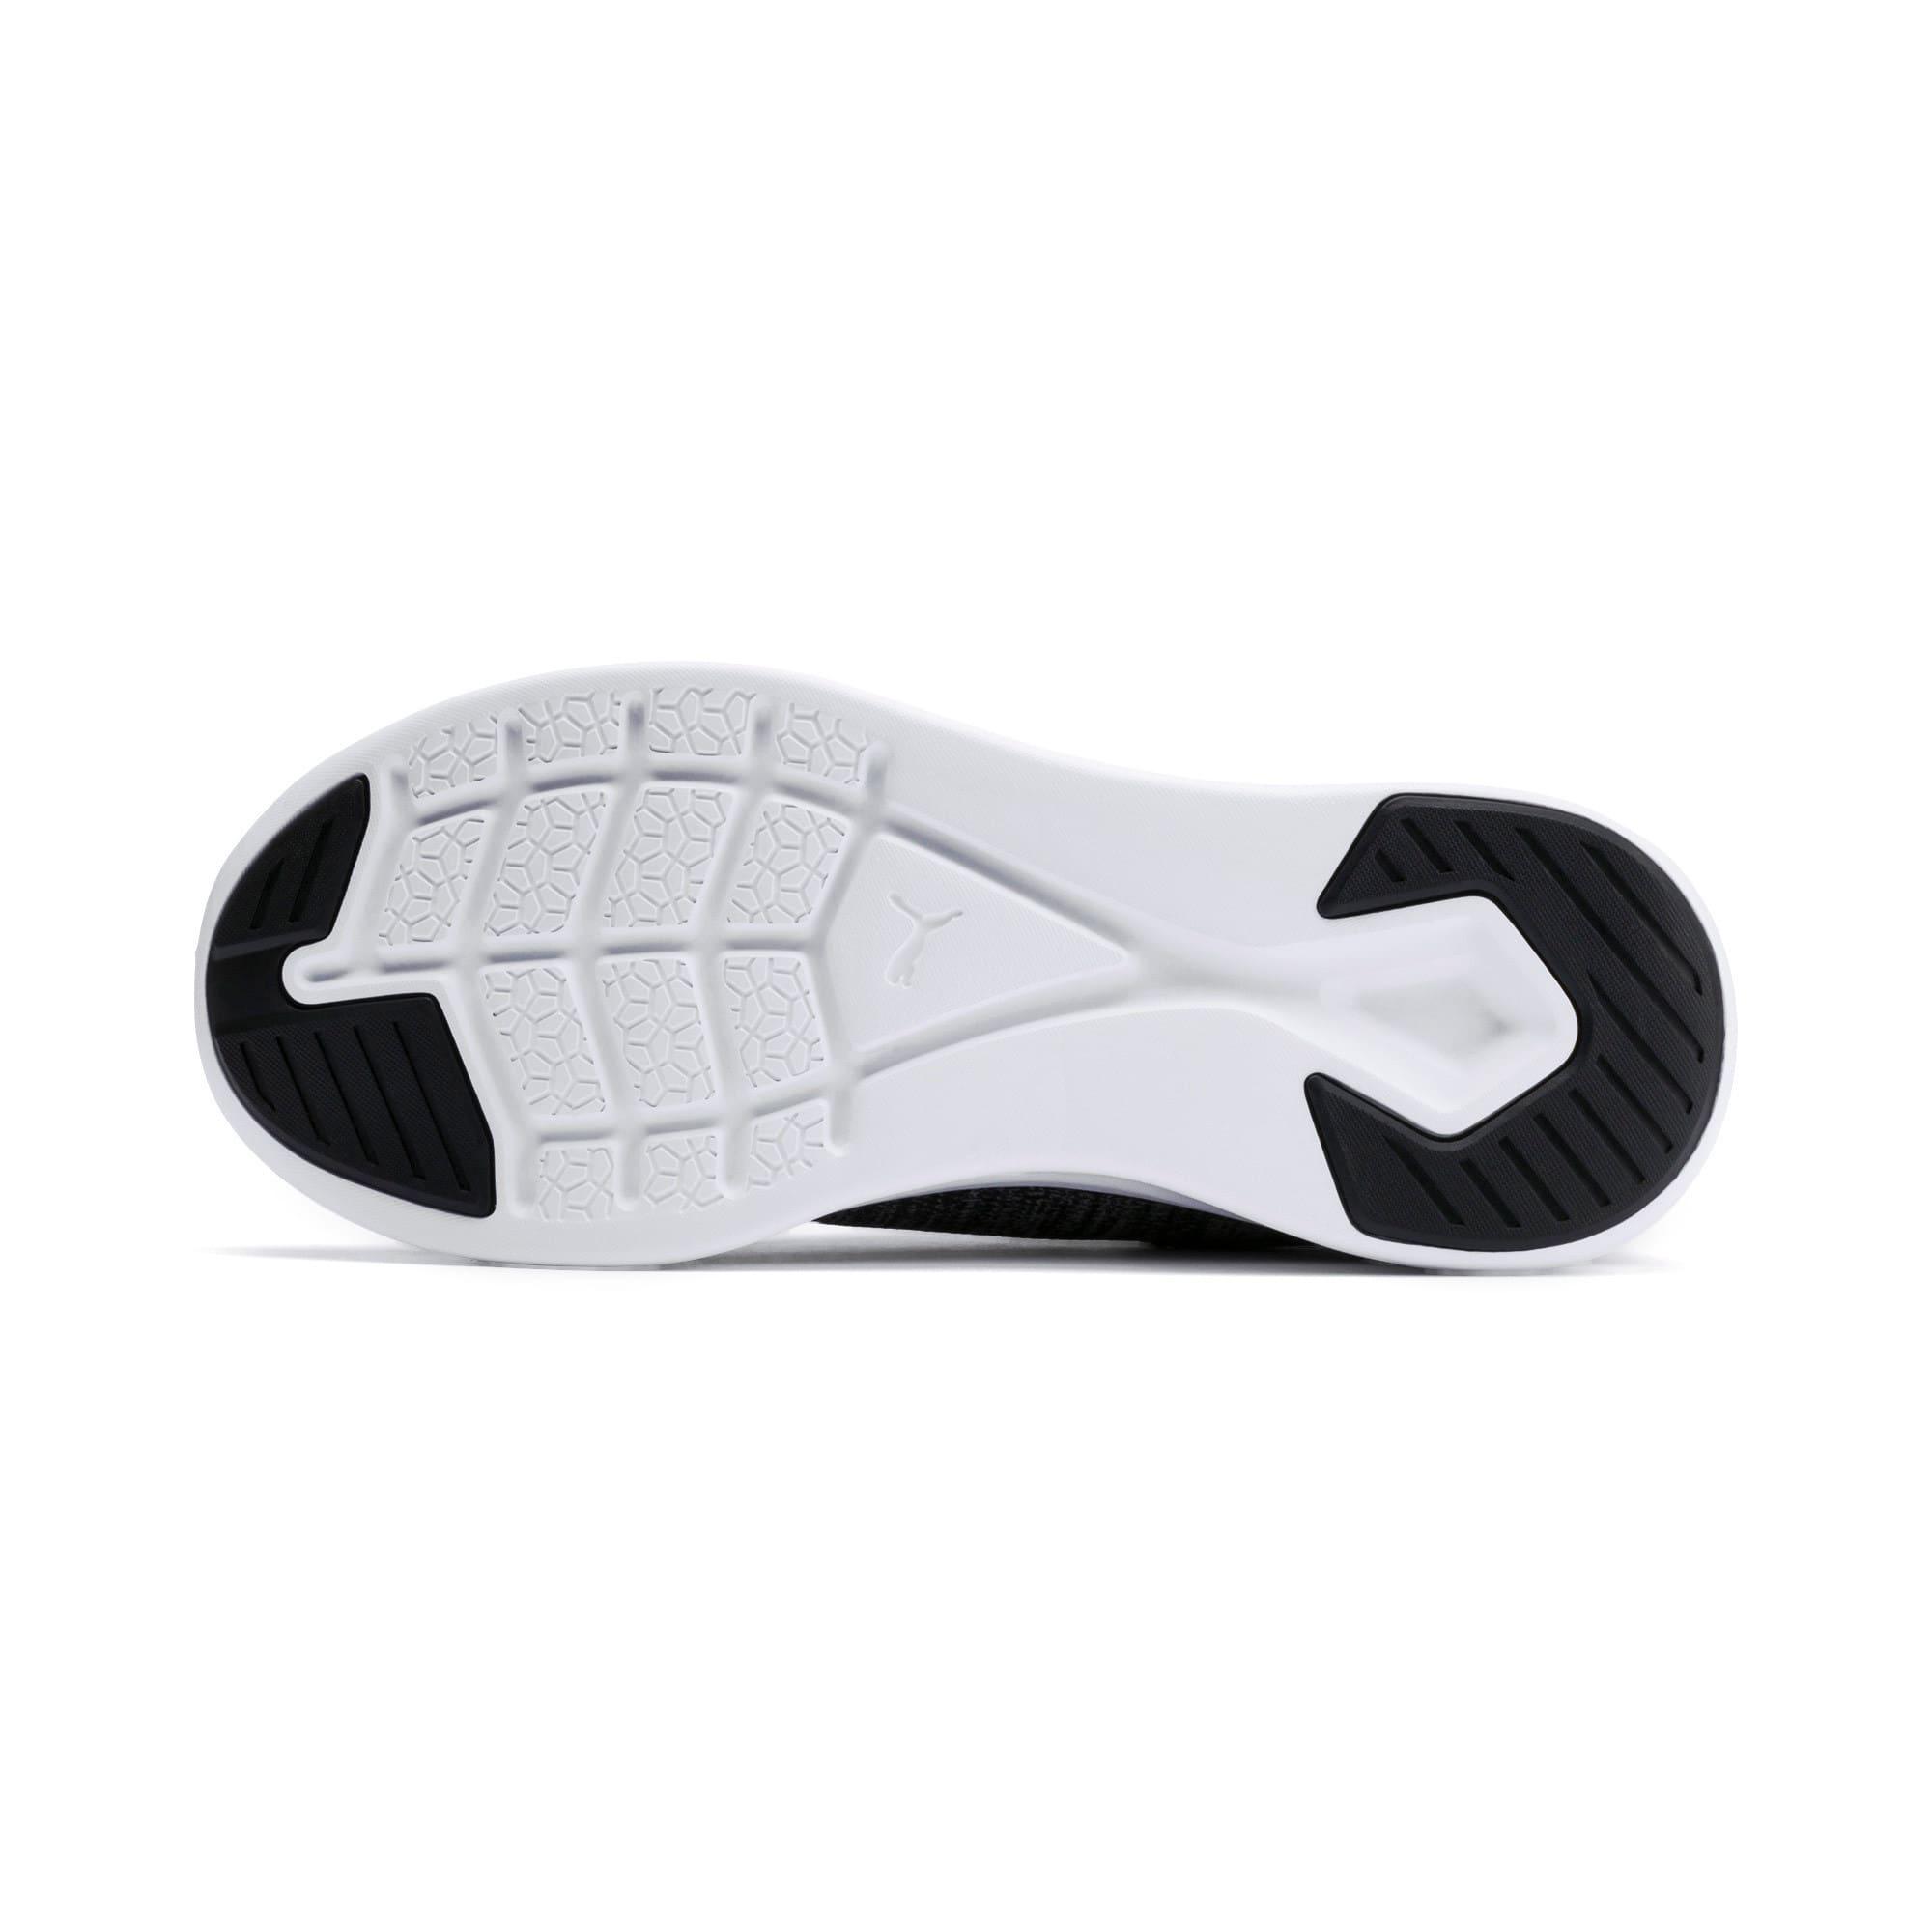 Thumbnail 5 of IGNITE Flash evoKNIT Women's Running Shoes, Black-Charcoal-Fair Aqua, medium-IND